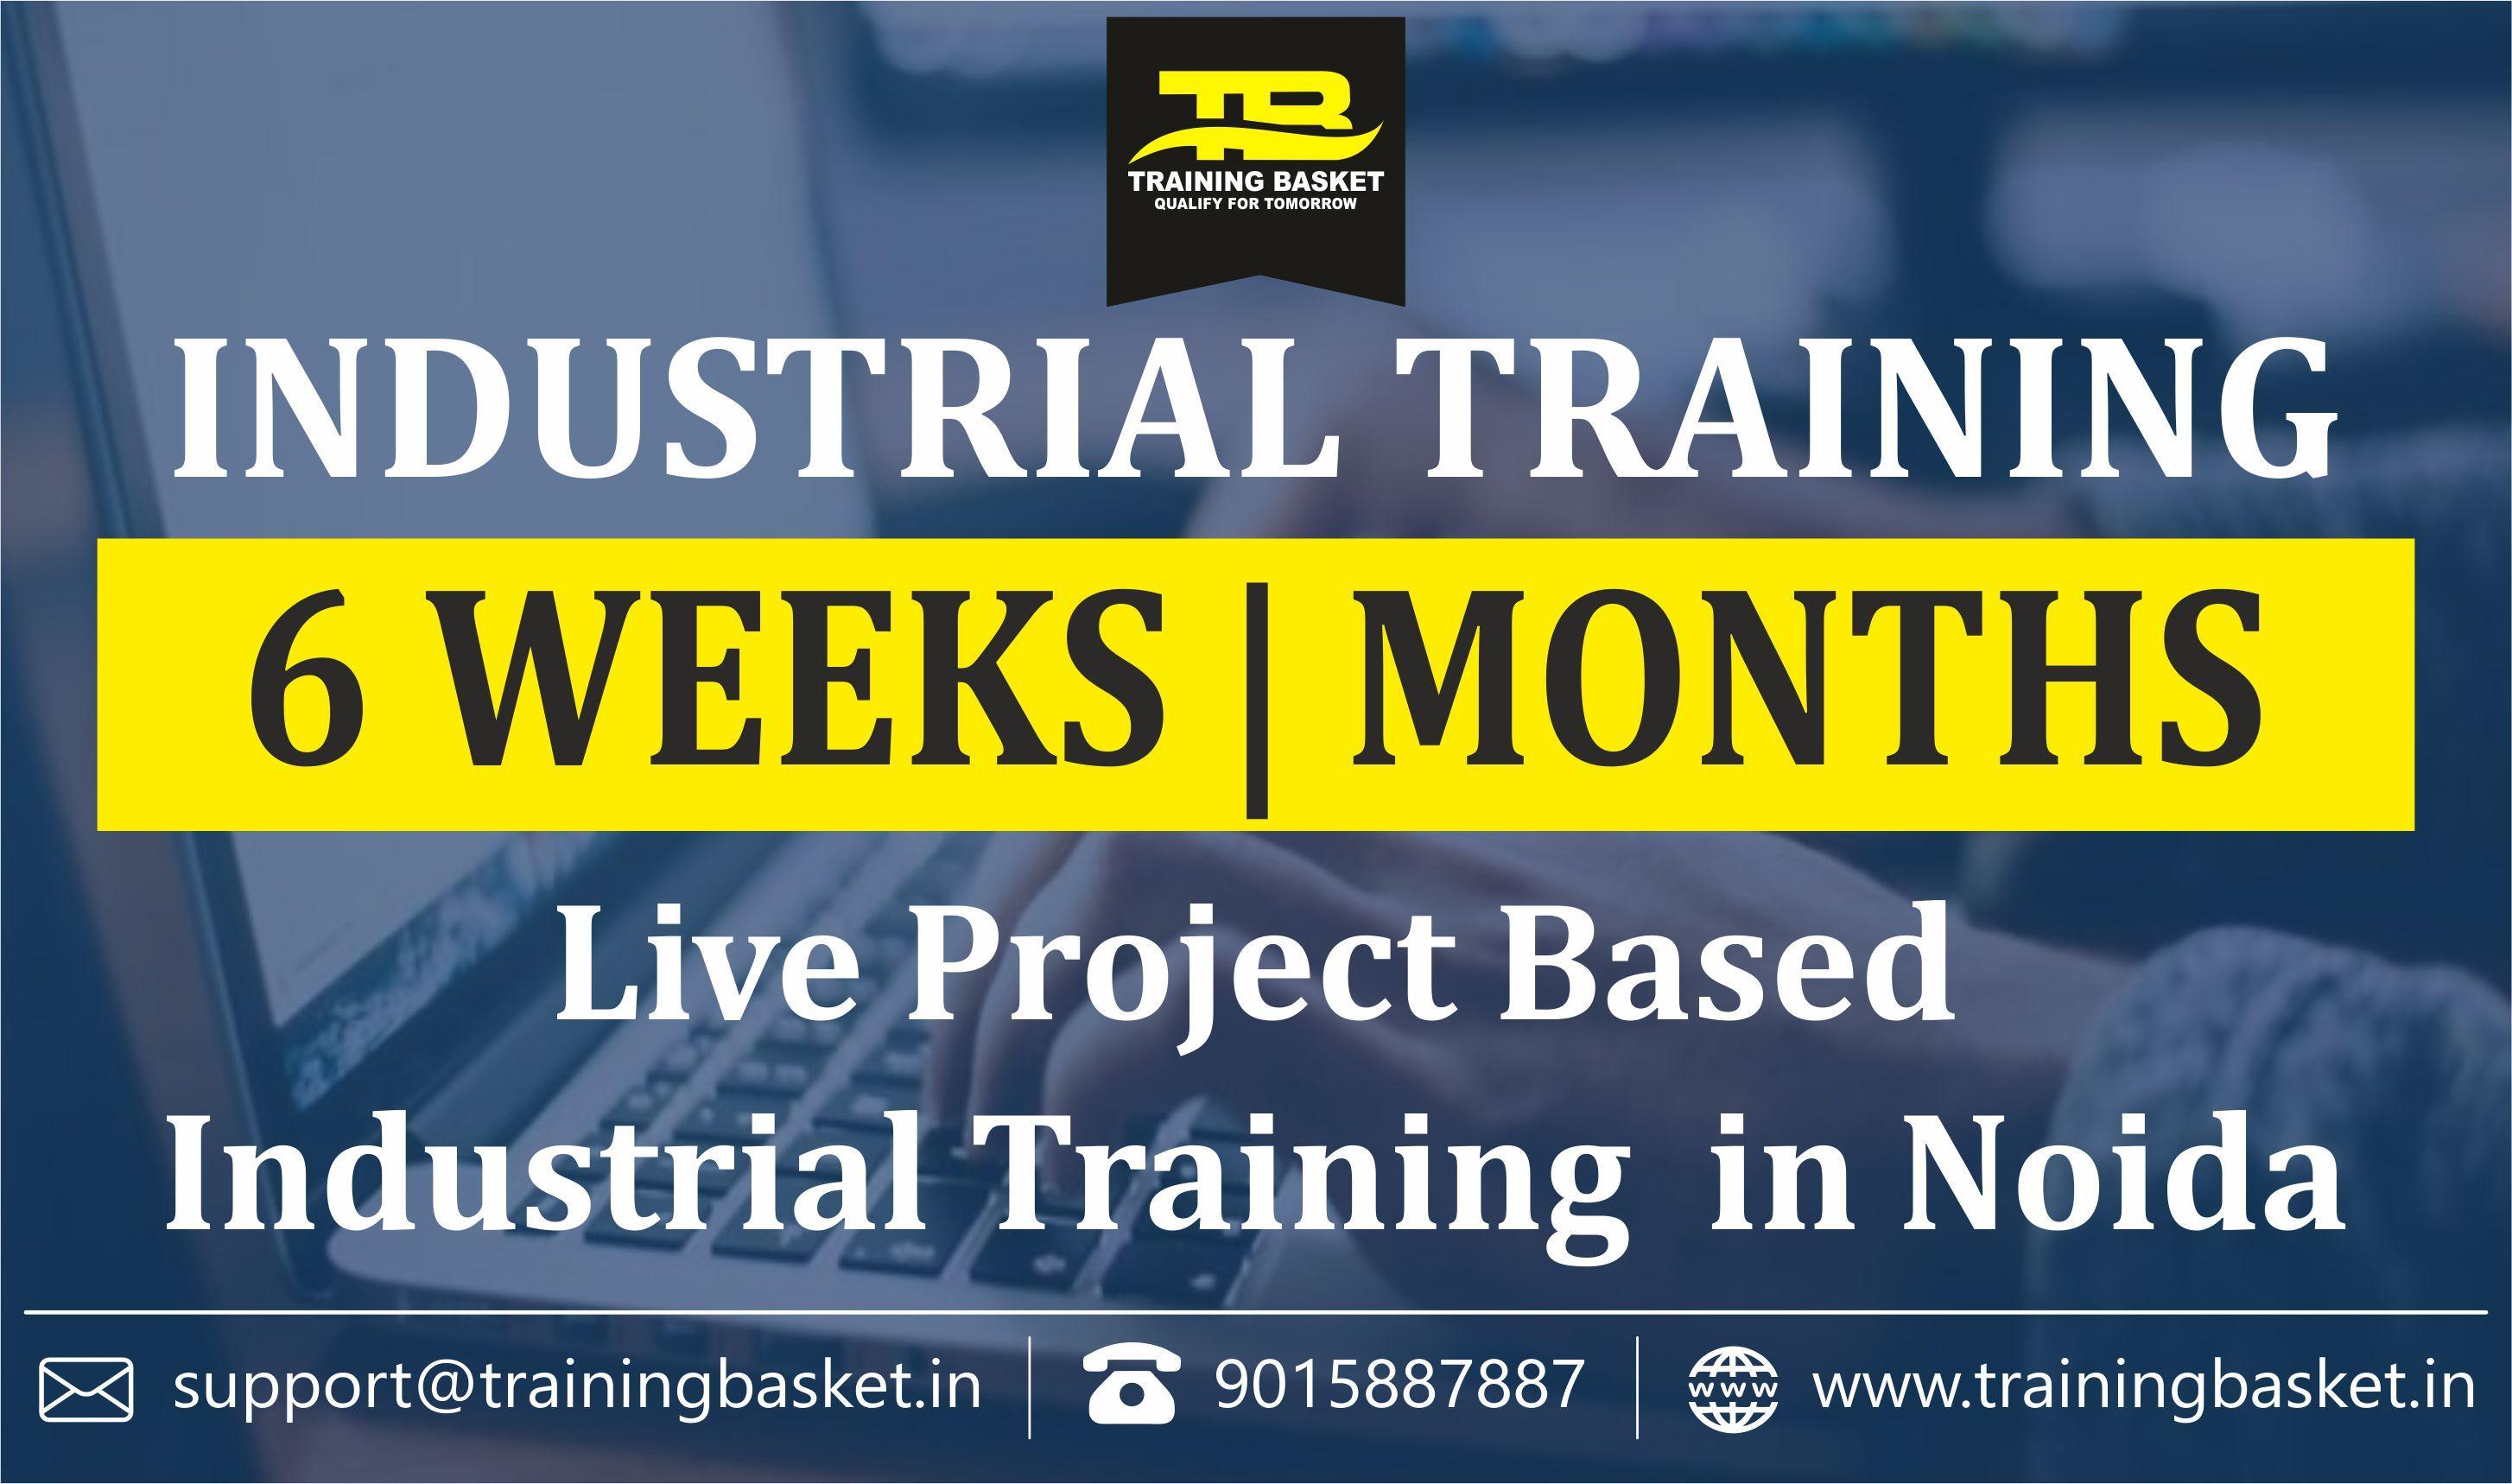 Industrial Training in noida Job training, Graduation